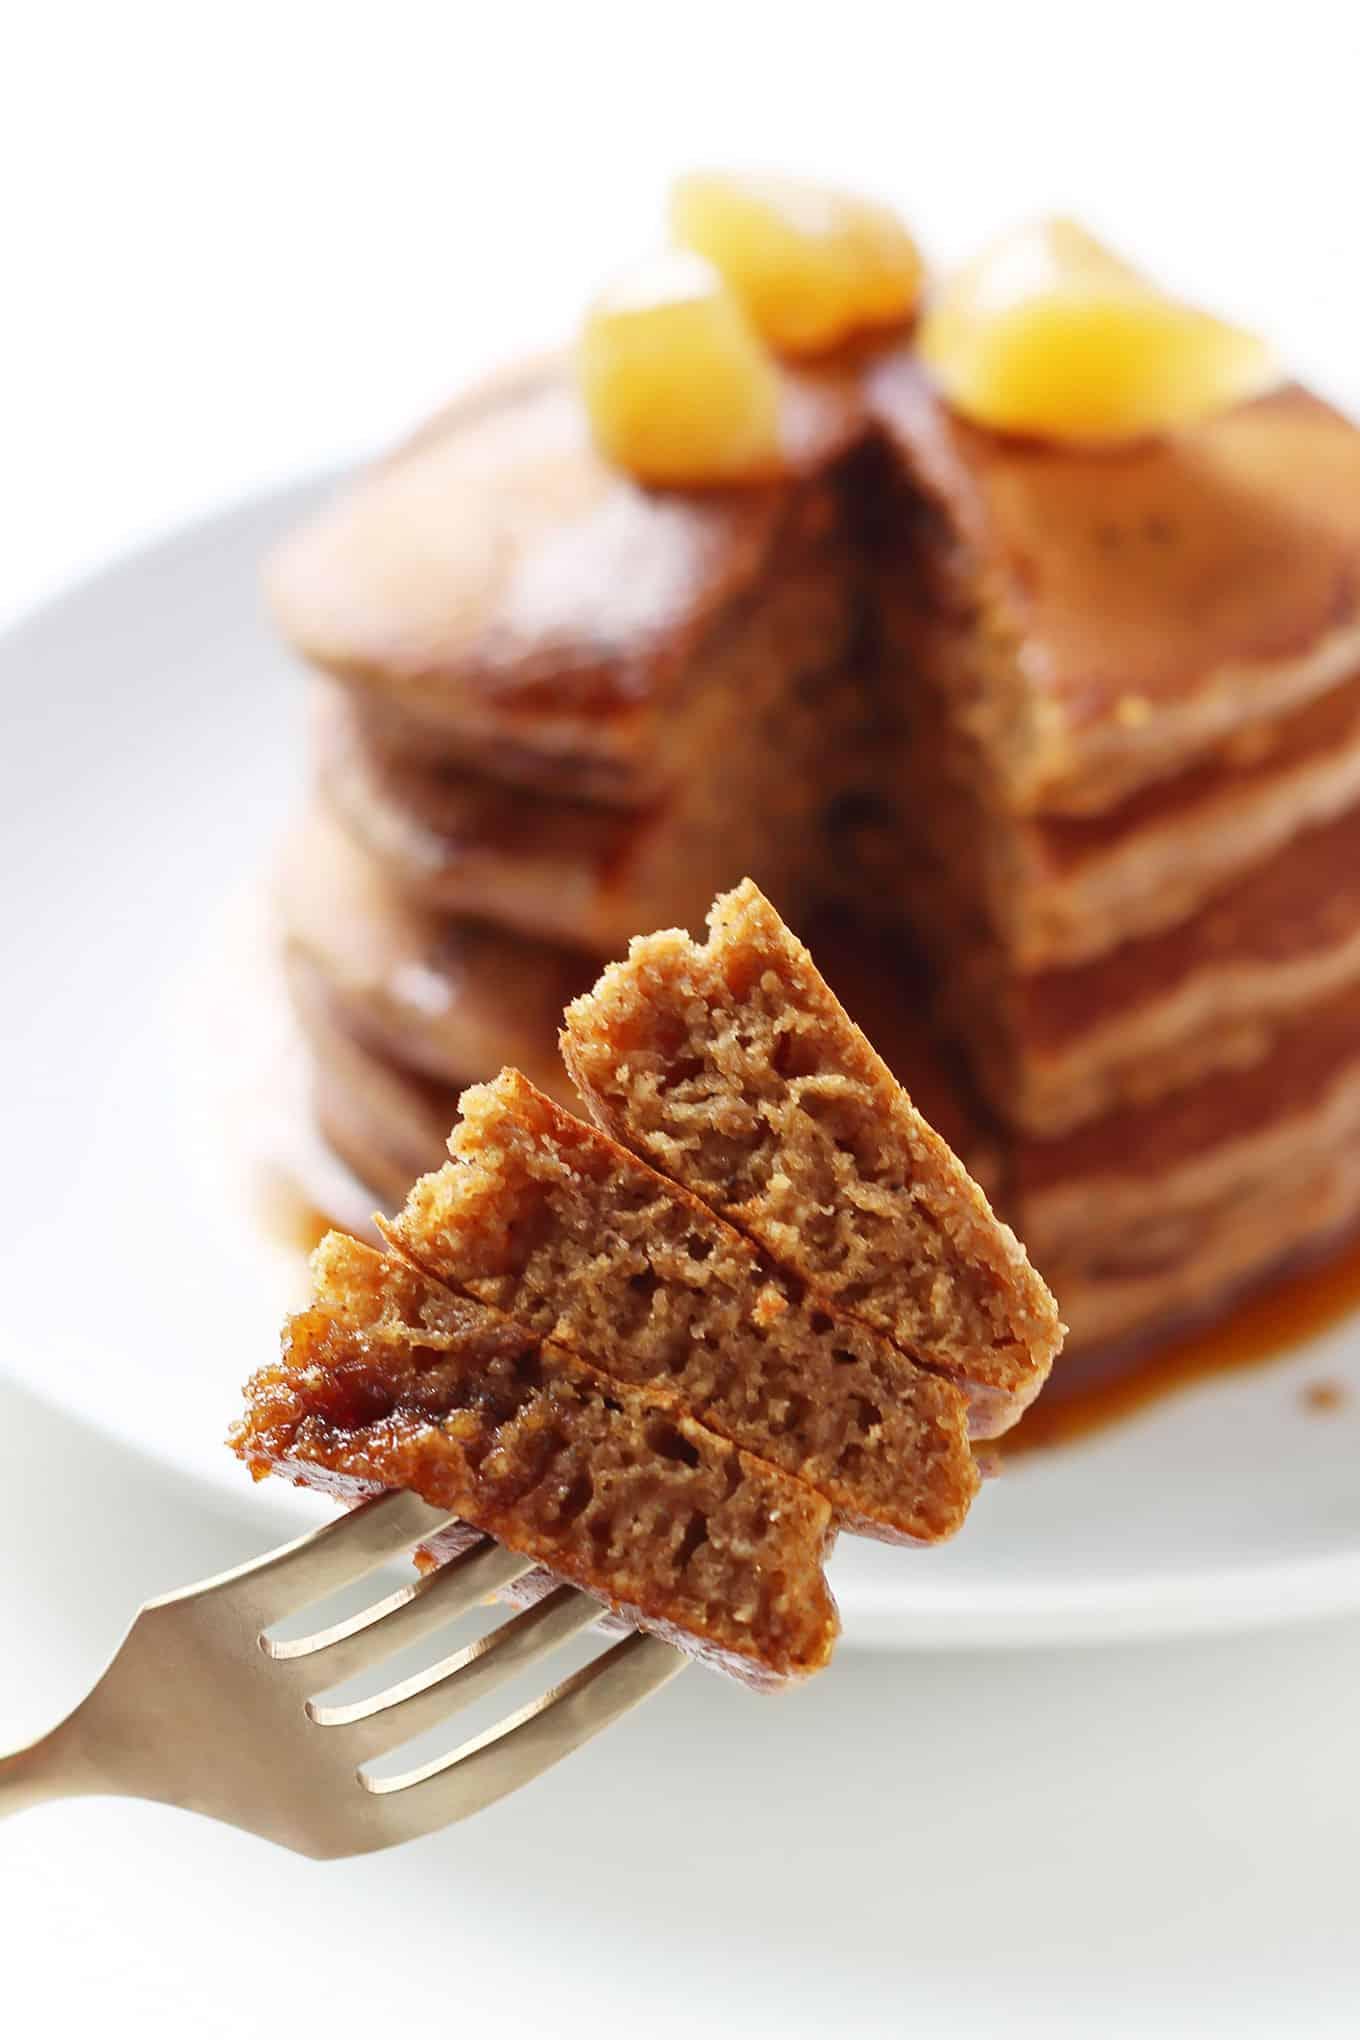 Forkful of Gingerbread Pancakes